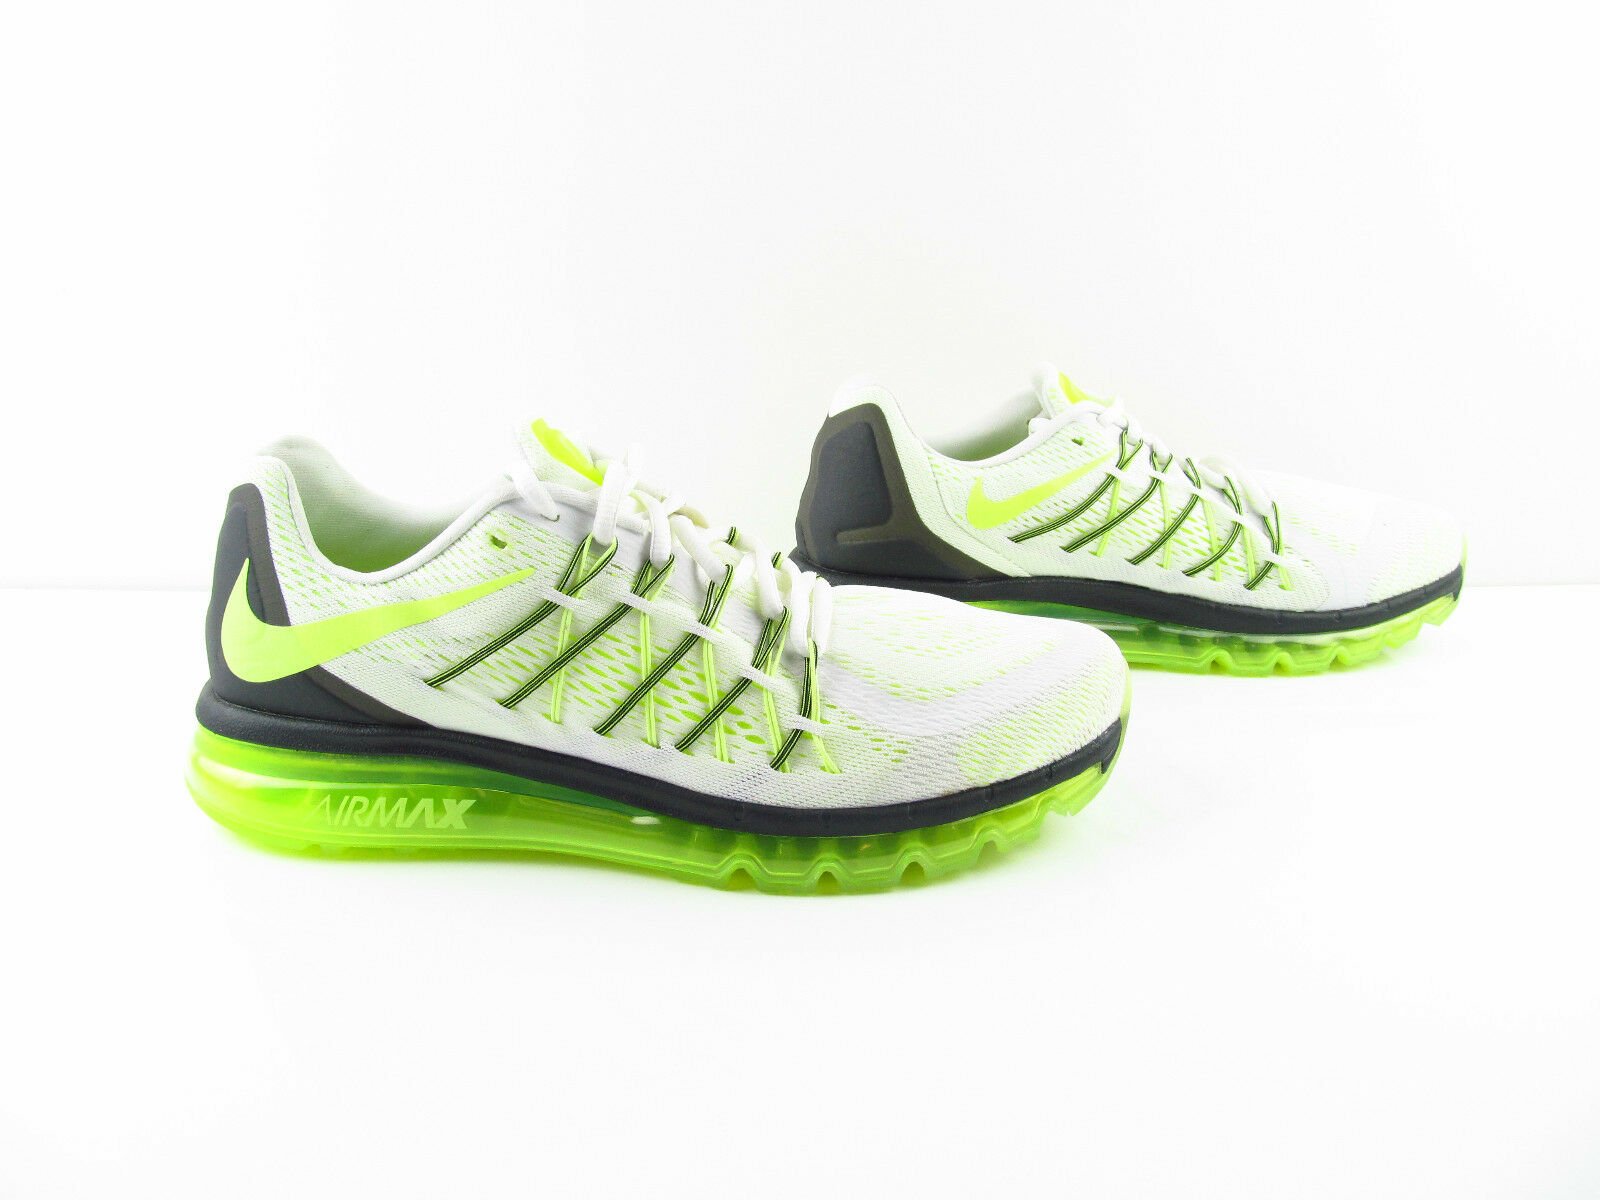 Nike Air Max 2018 Noir blanc Volt Noir Green Multicolor Running Eur 44.5 45.5